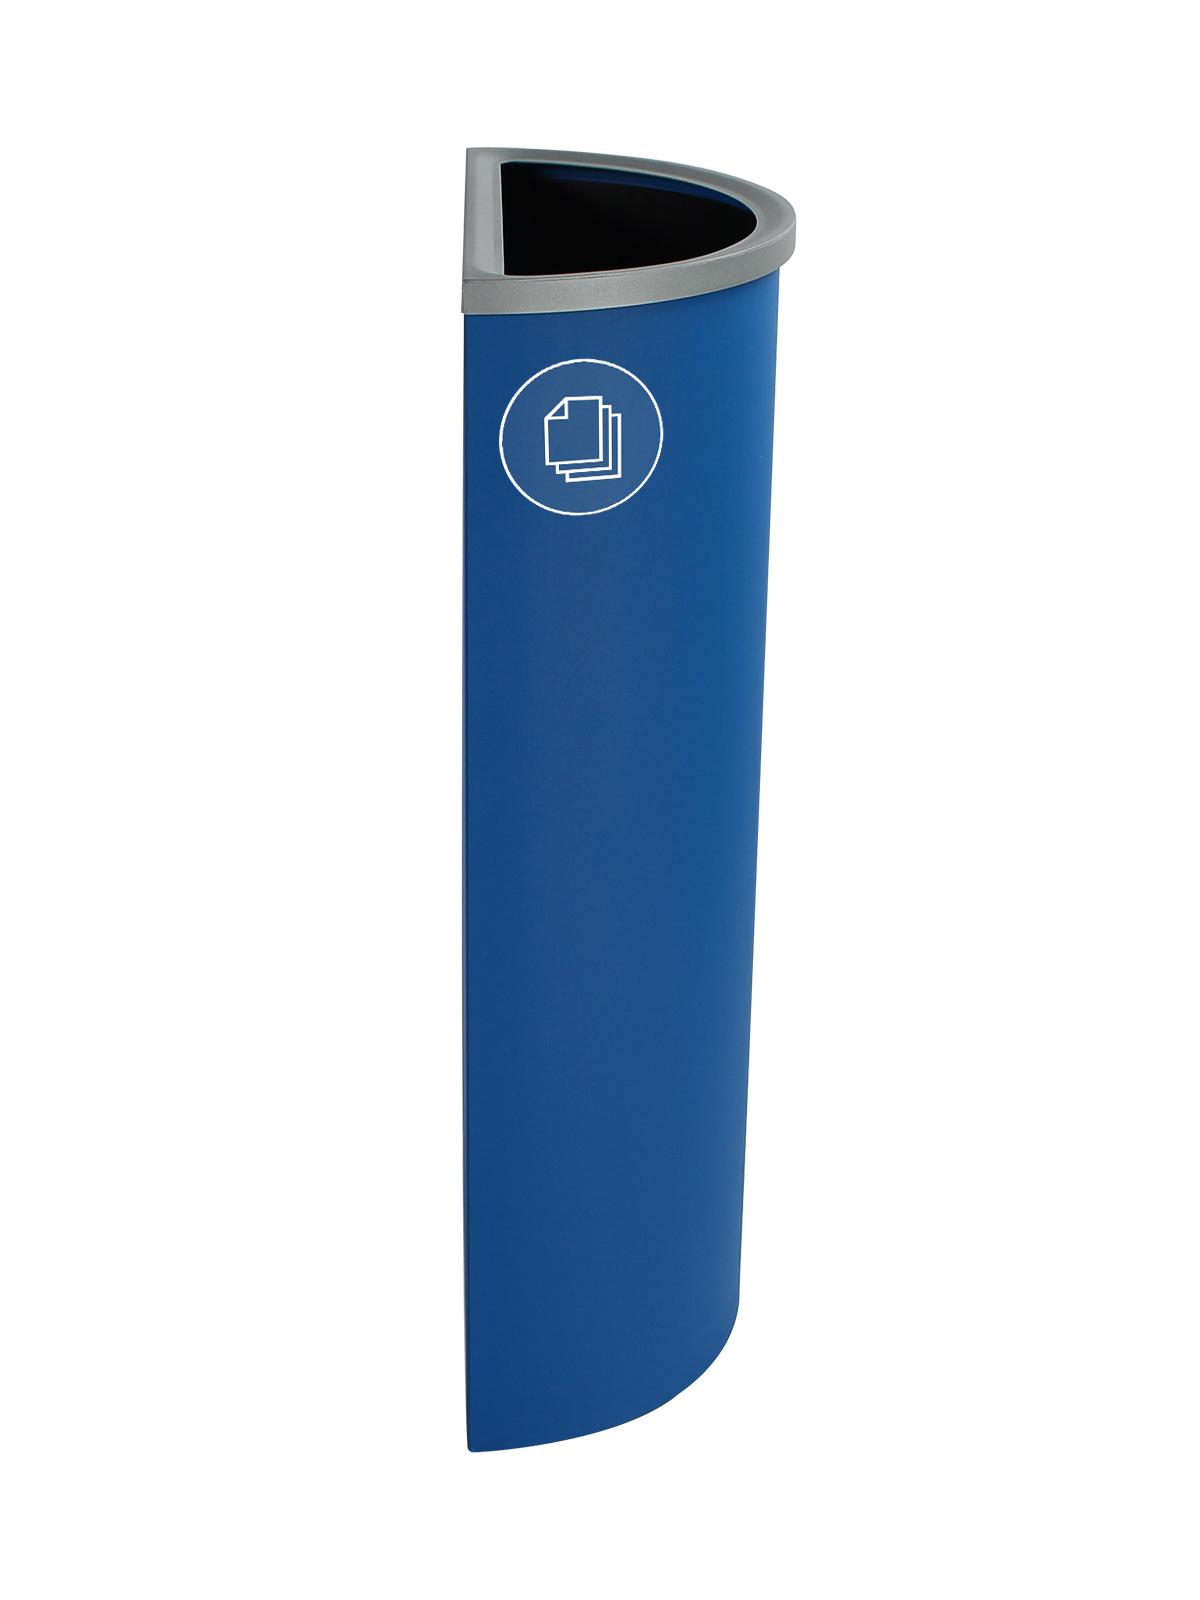 SPECTRUM - Single - Ellipse Slim - Paper - Full - Blue